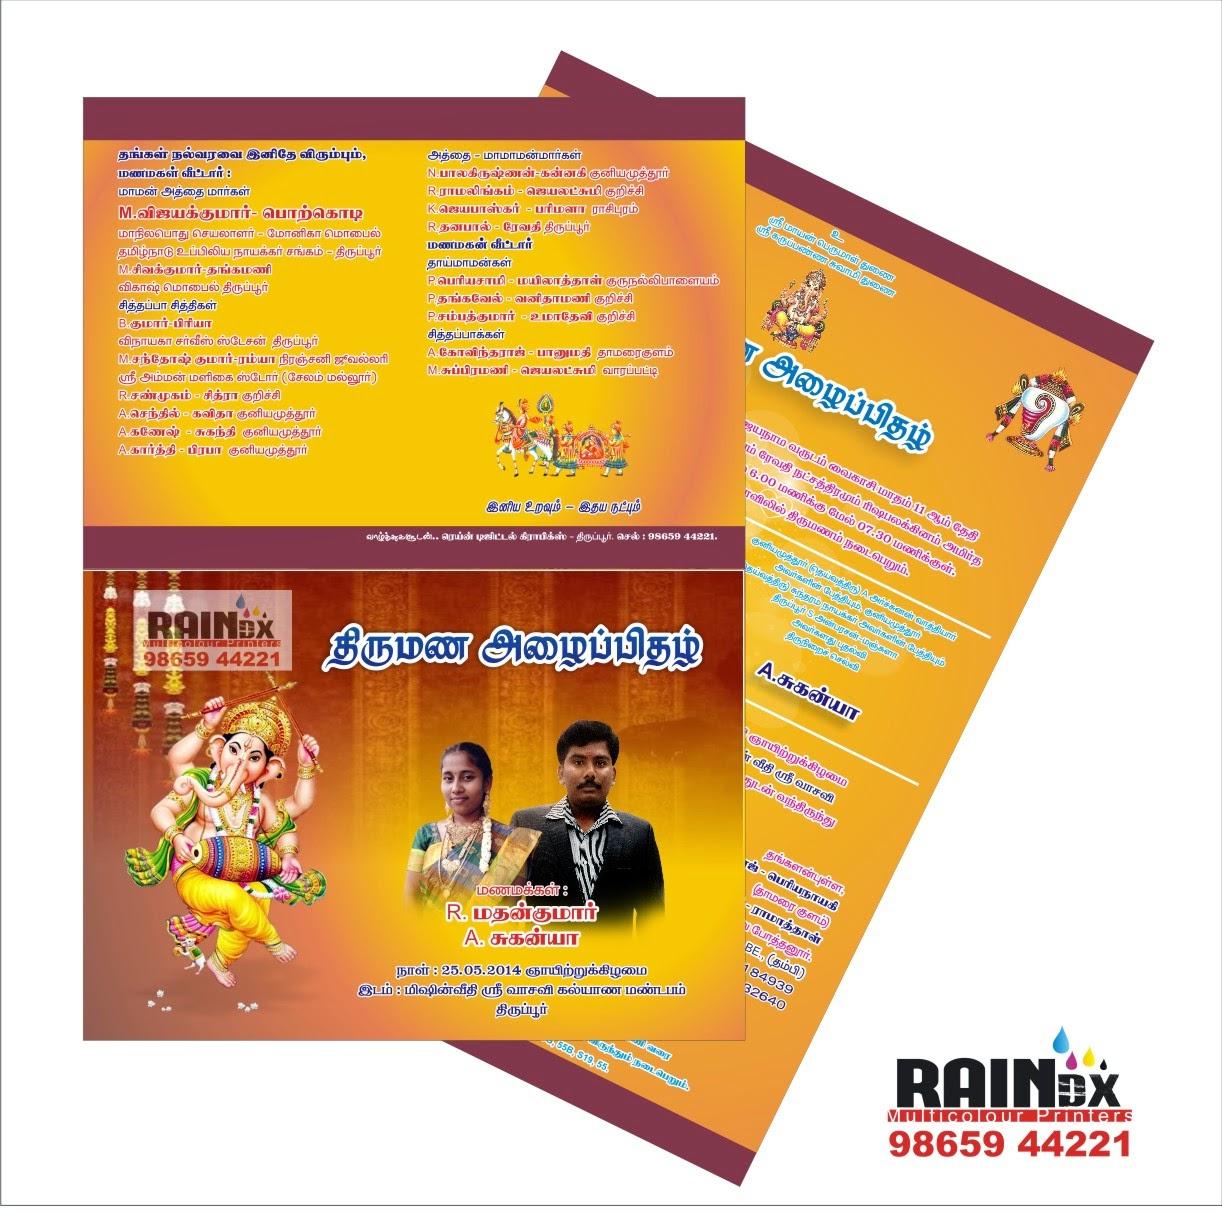 Marriage Invitation R Mathankumar Weeds A Suganya Coimbatore